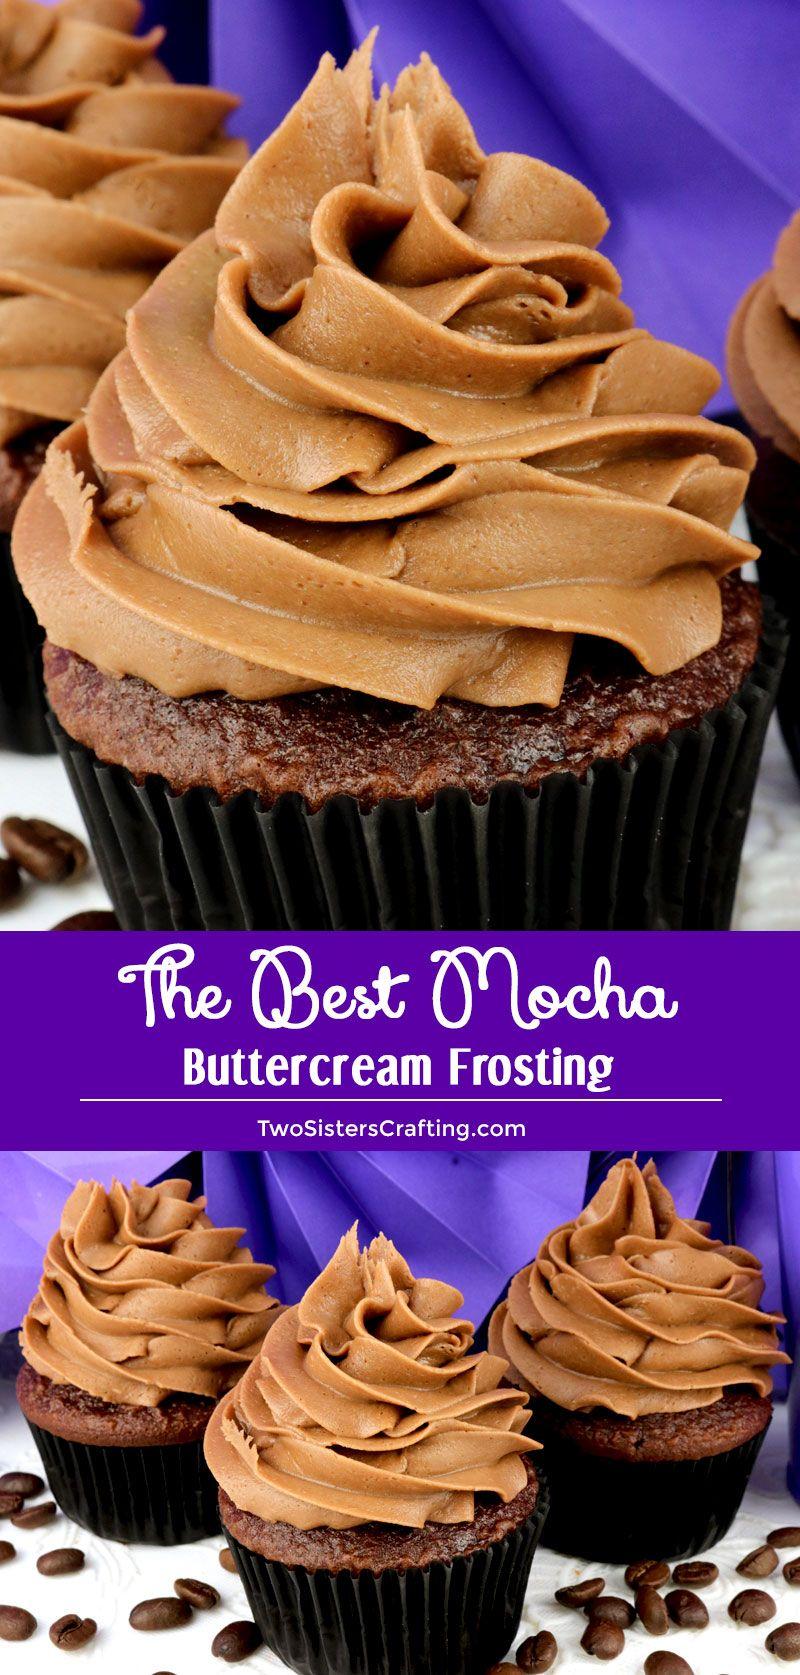 The Best Mocha Buttercream Frosting #buttercream